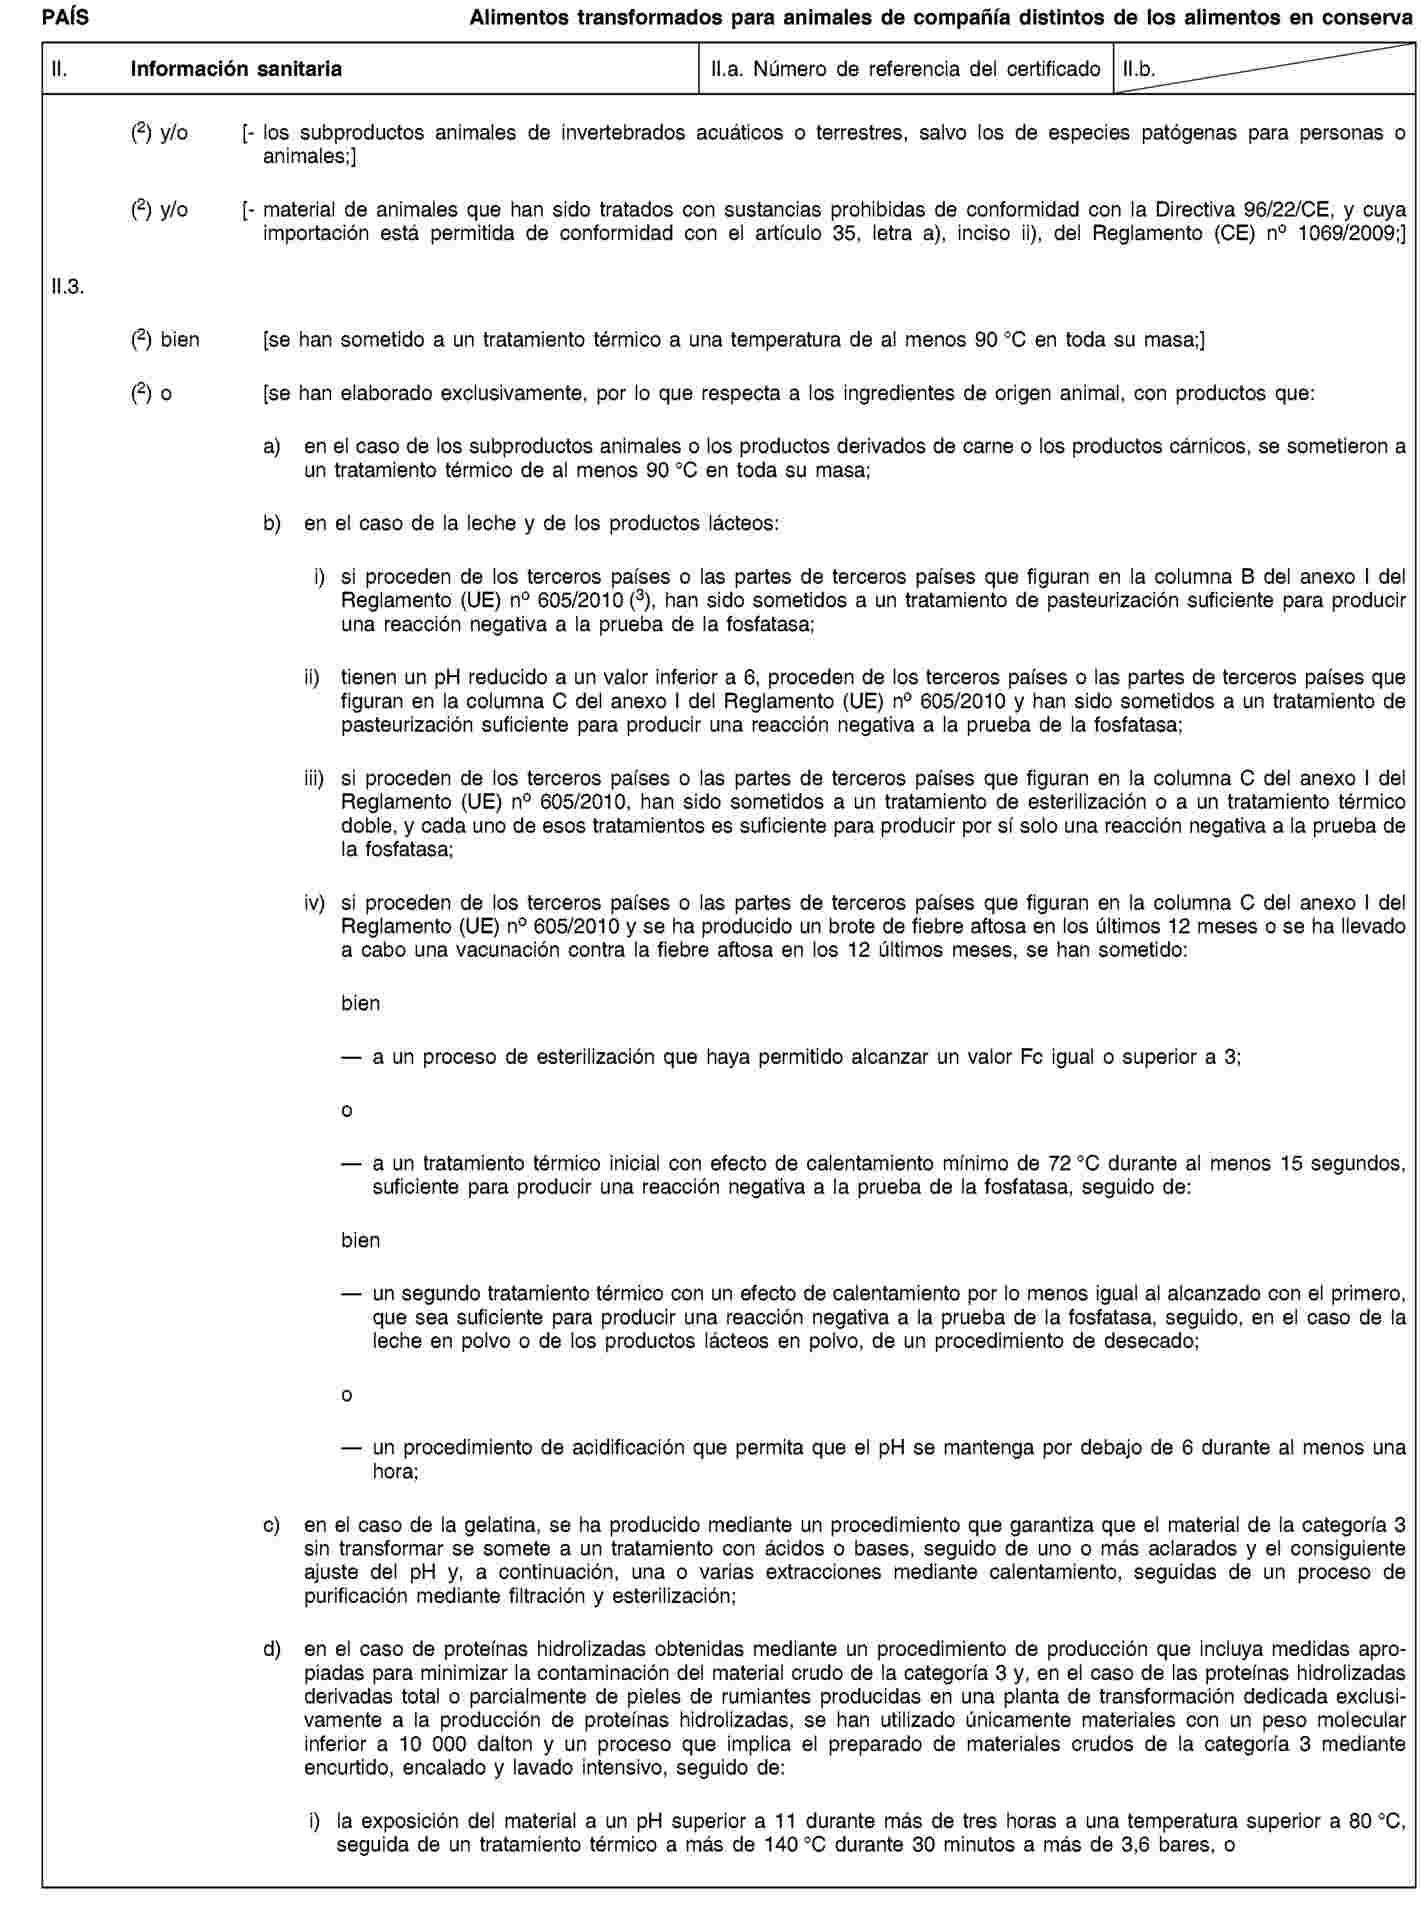 Imagen: https://eur-lex.europa.eu/resource.html?uri=uriserv:OJ.L_.2011.054.01.0001.01.SPA.xhtml.L_2011054ES.01013801.tif.jpg